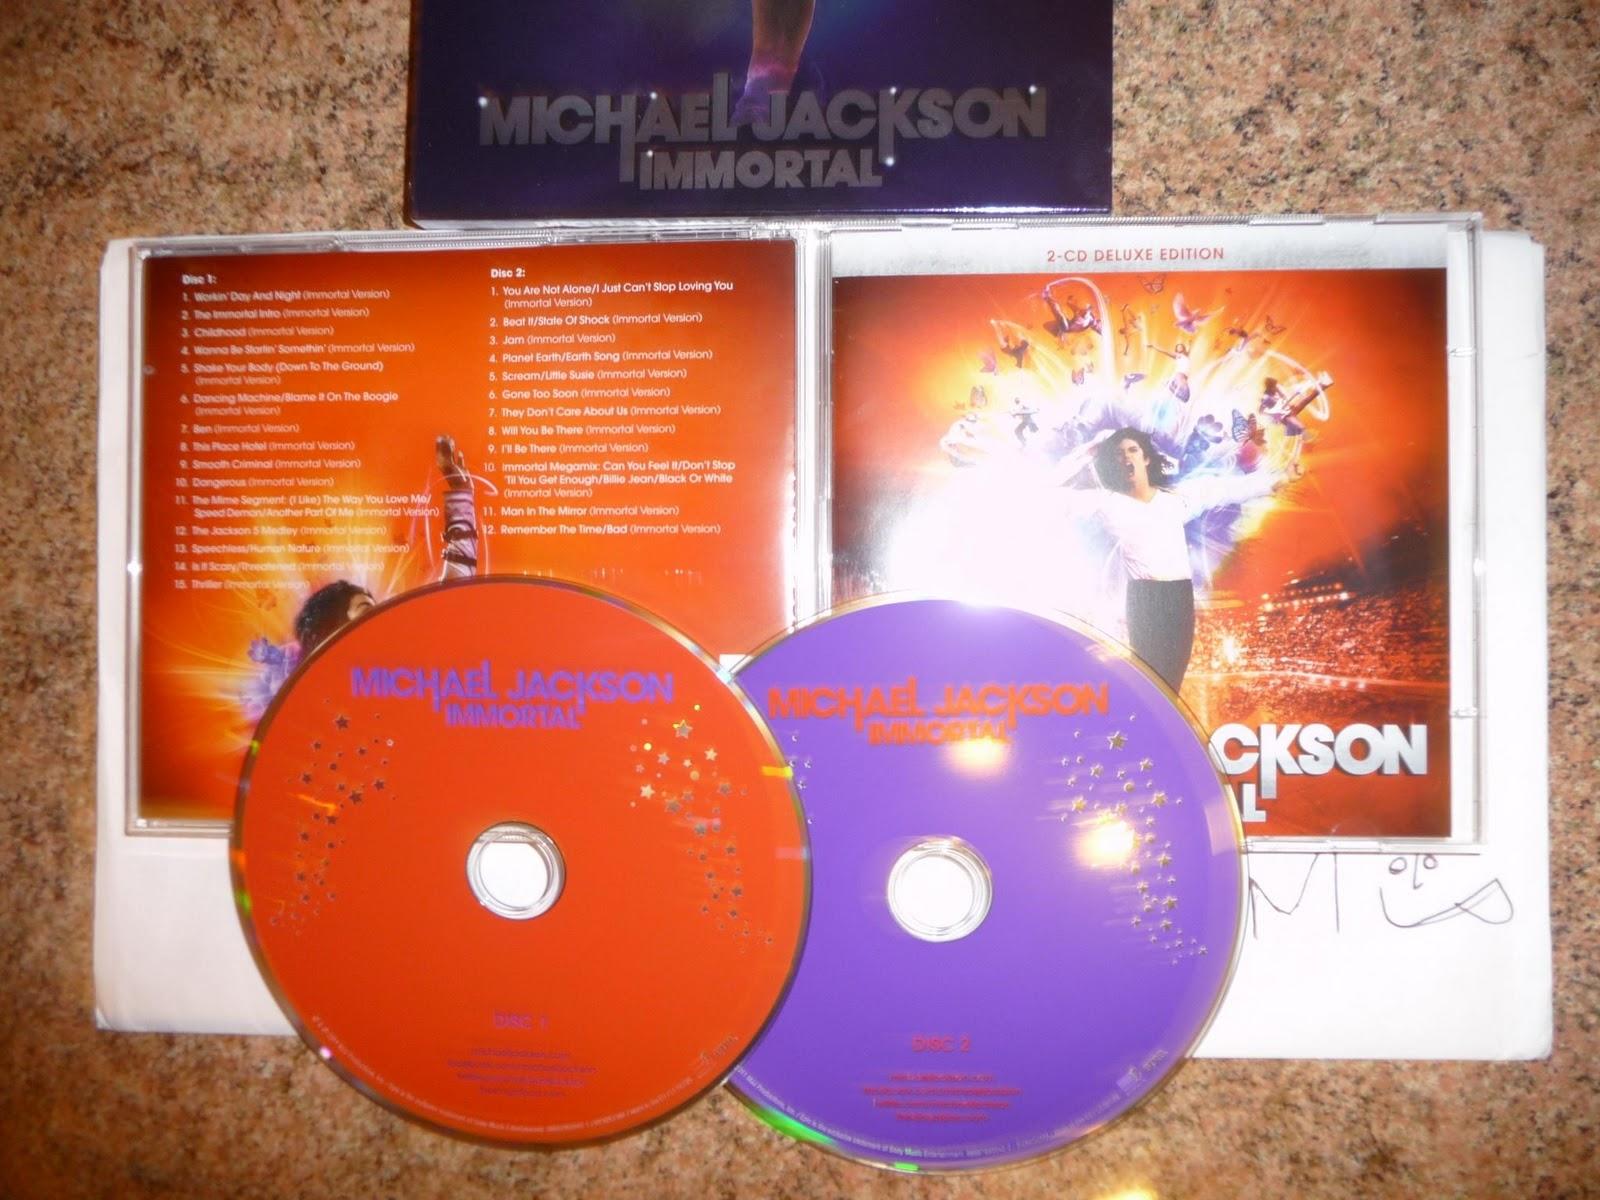 http://2.bp.blogspot.com/-qhw-BGi7oCw/Tw6-VhXwq4I/AAAAAAAAEak/zl5KsvHLf7Y/s1600/000-michael_jackson-immortal-2cd-20112.jpg